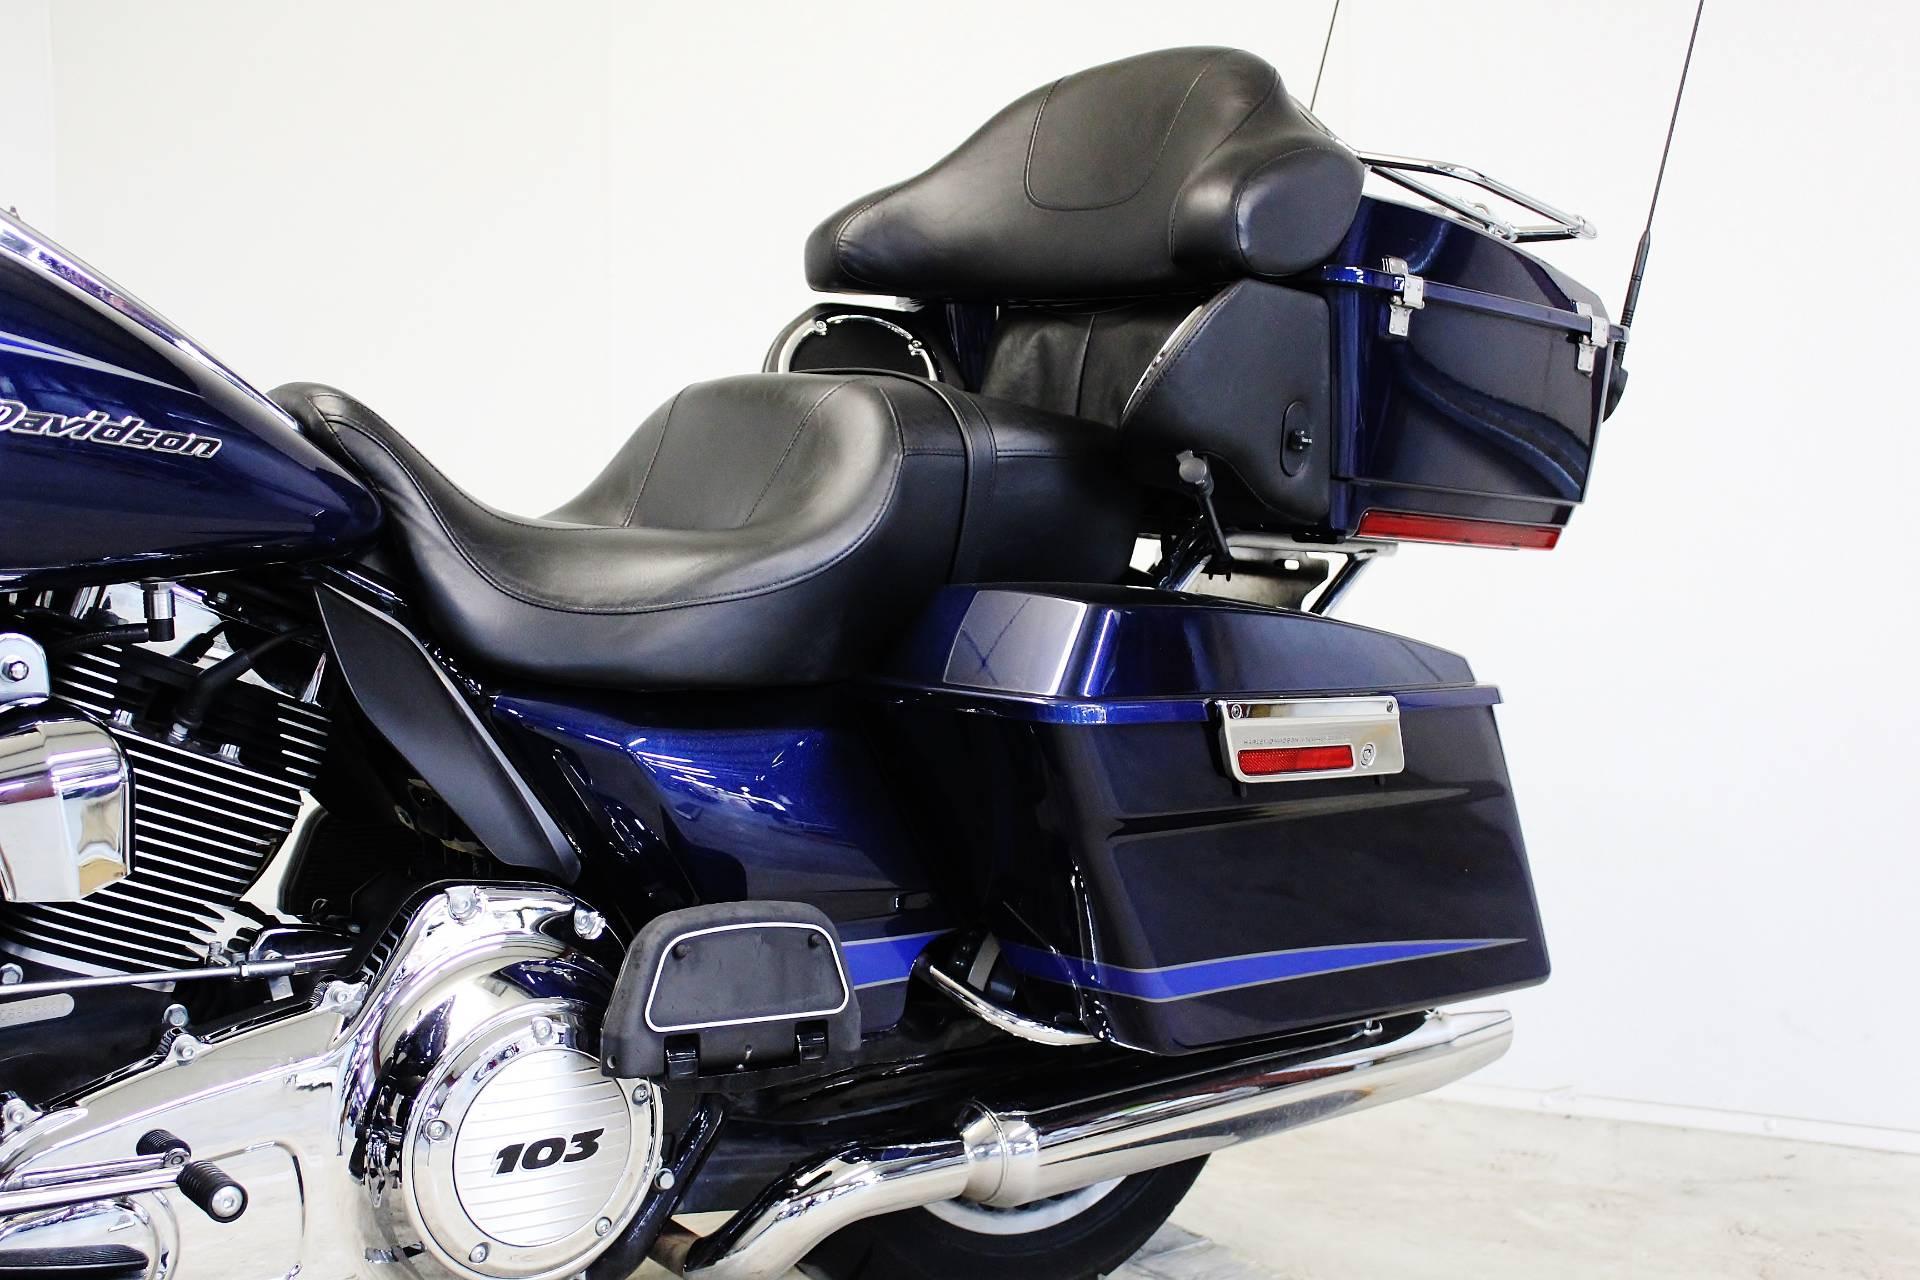 2012 Harley-Davidson Road Glide® Ultra in Pittsfield, Massachusetts